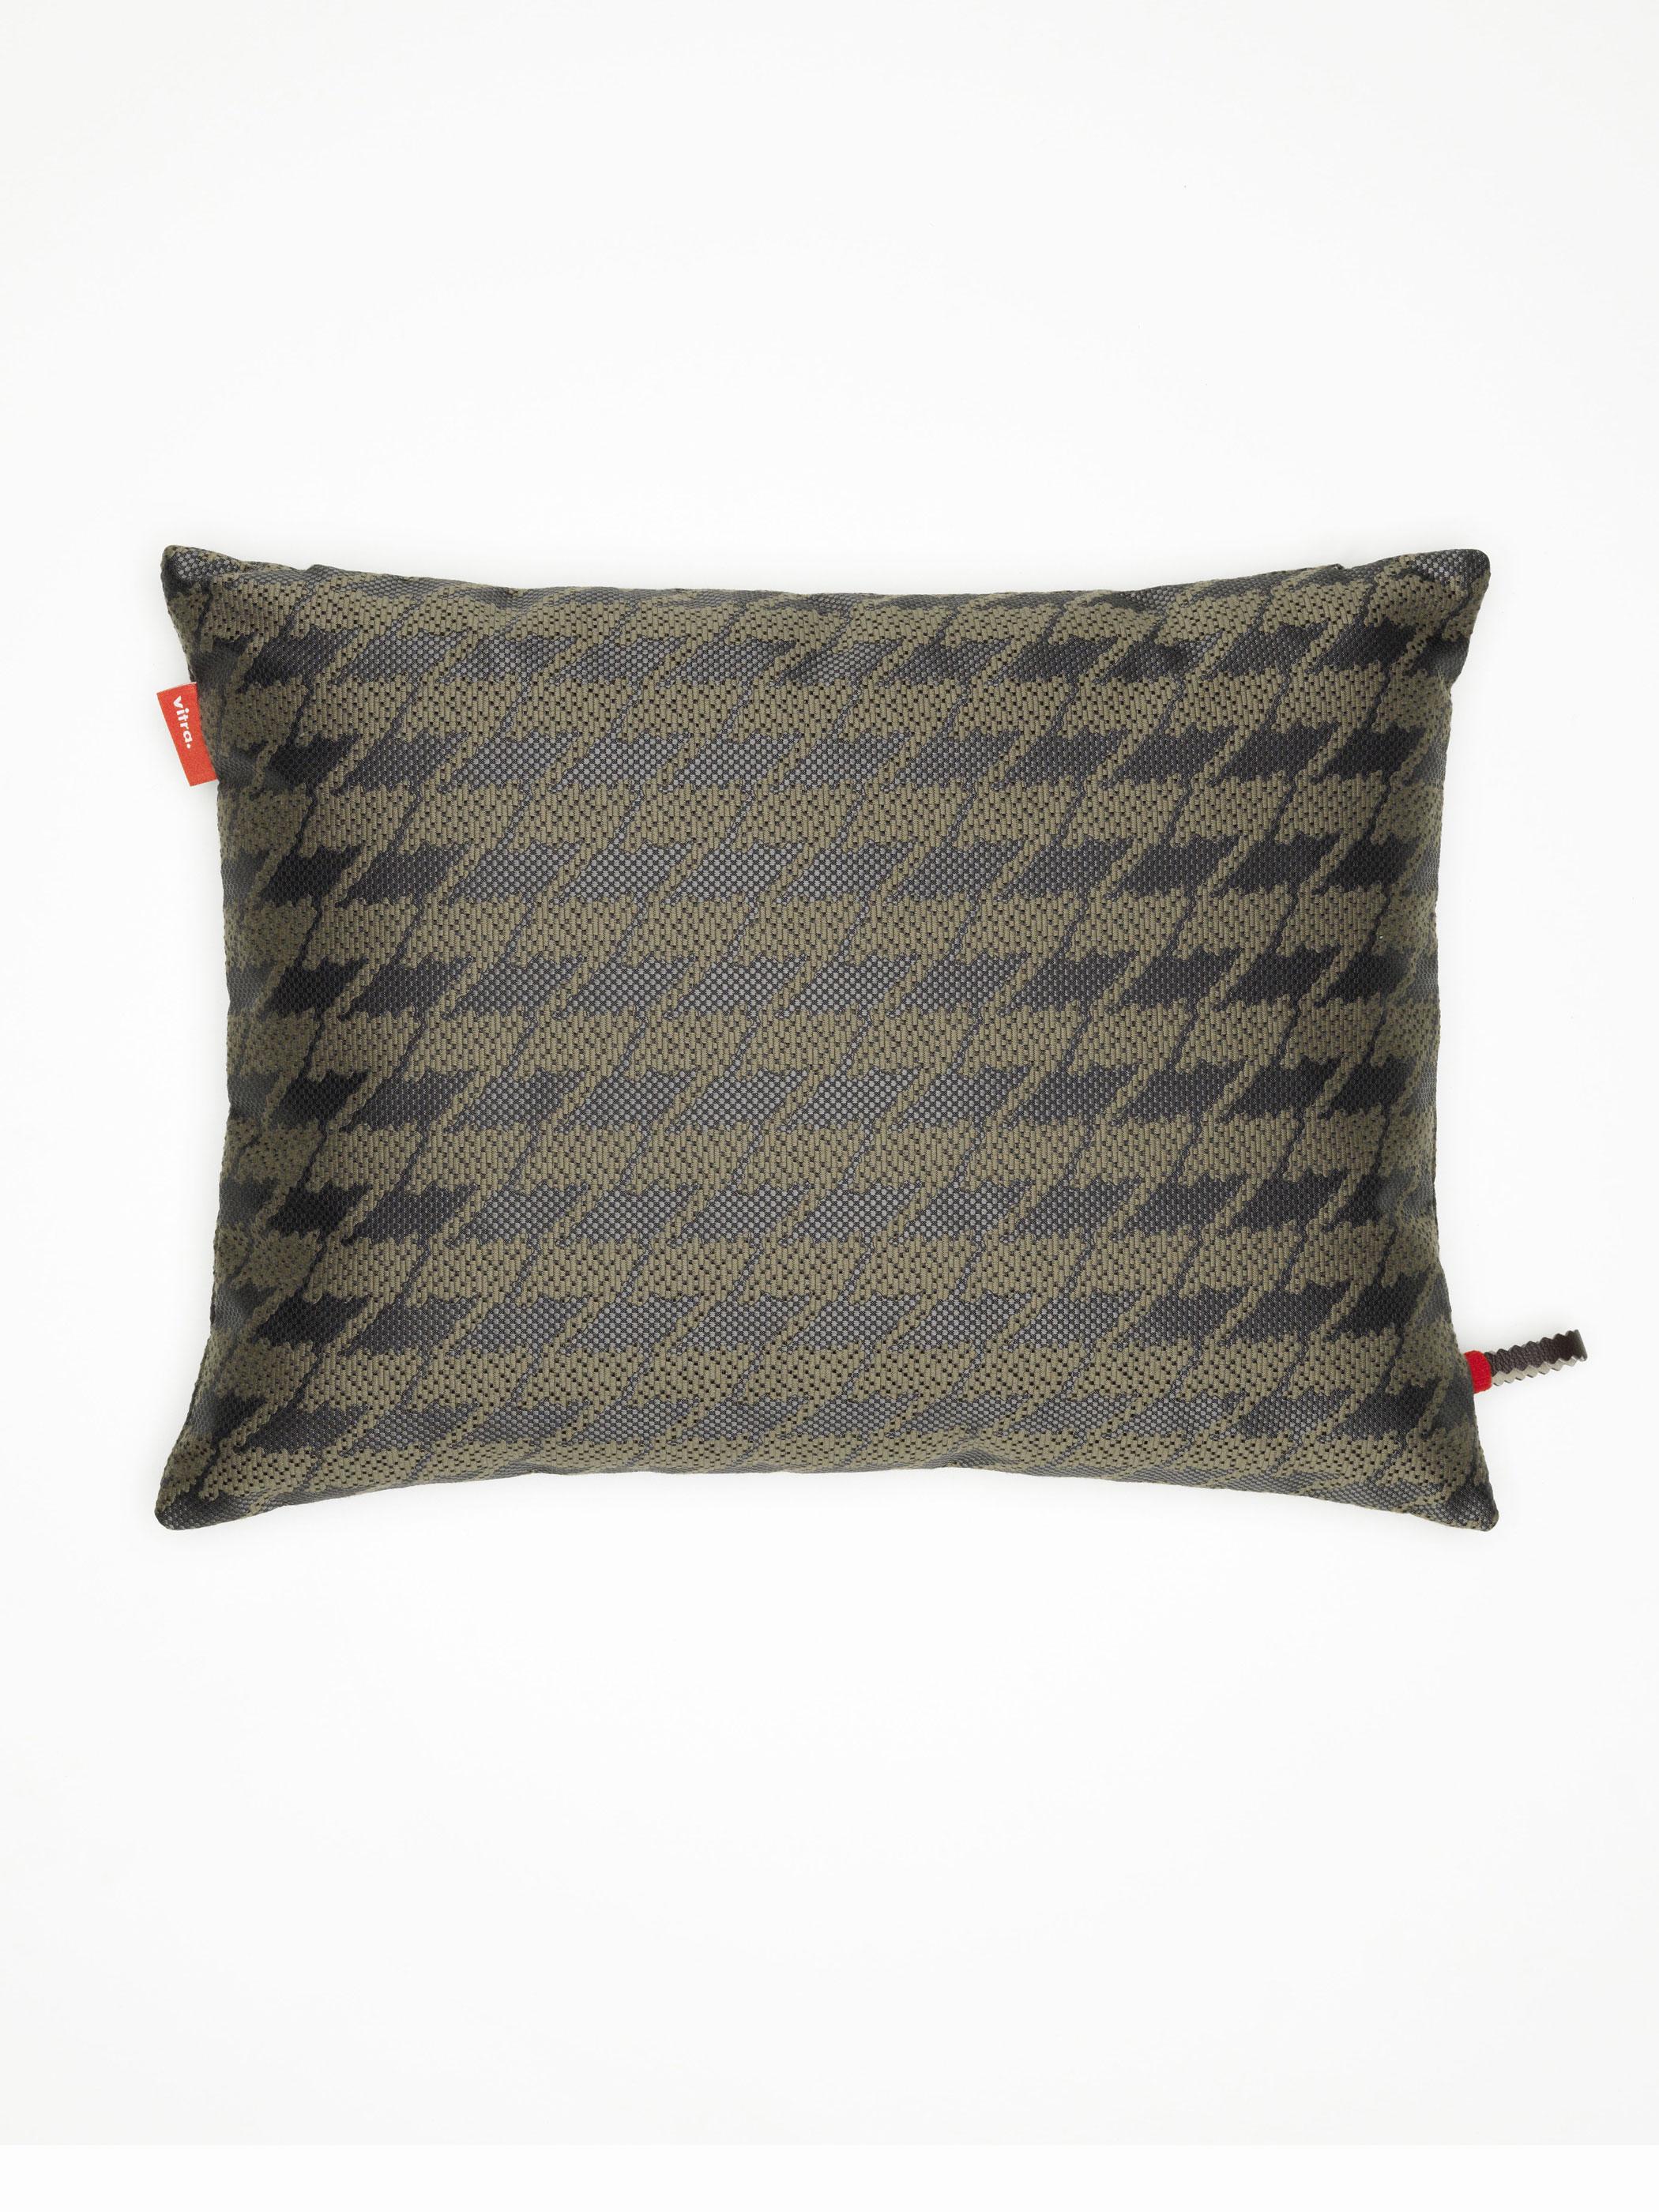 vitra kissen maharam repeat classic houndstooth cocoa produktdetails. Black Bedroom Furniture Sets. Home Design Ideas